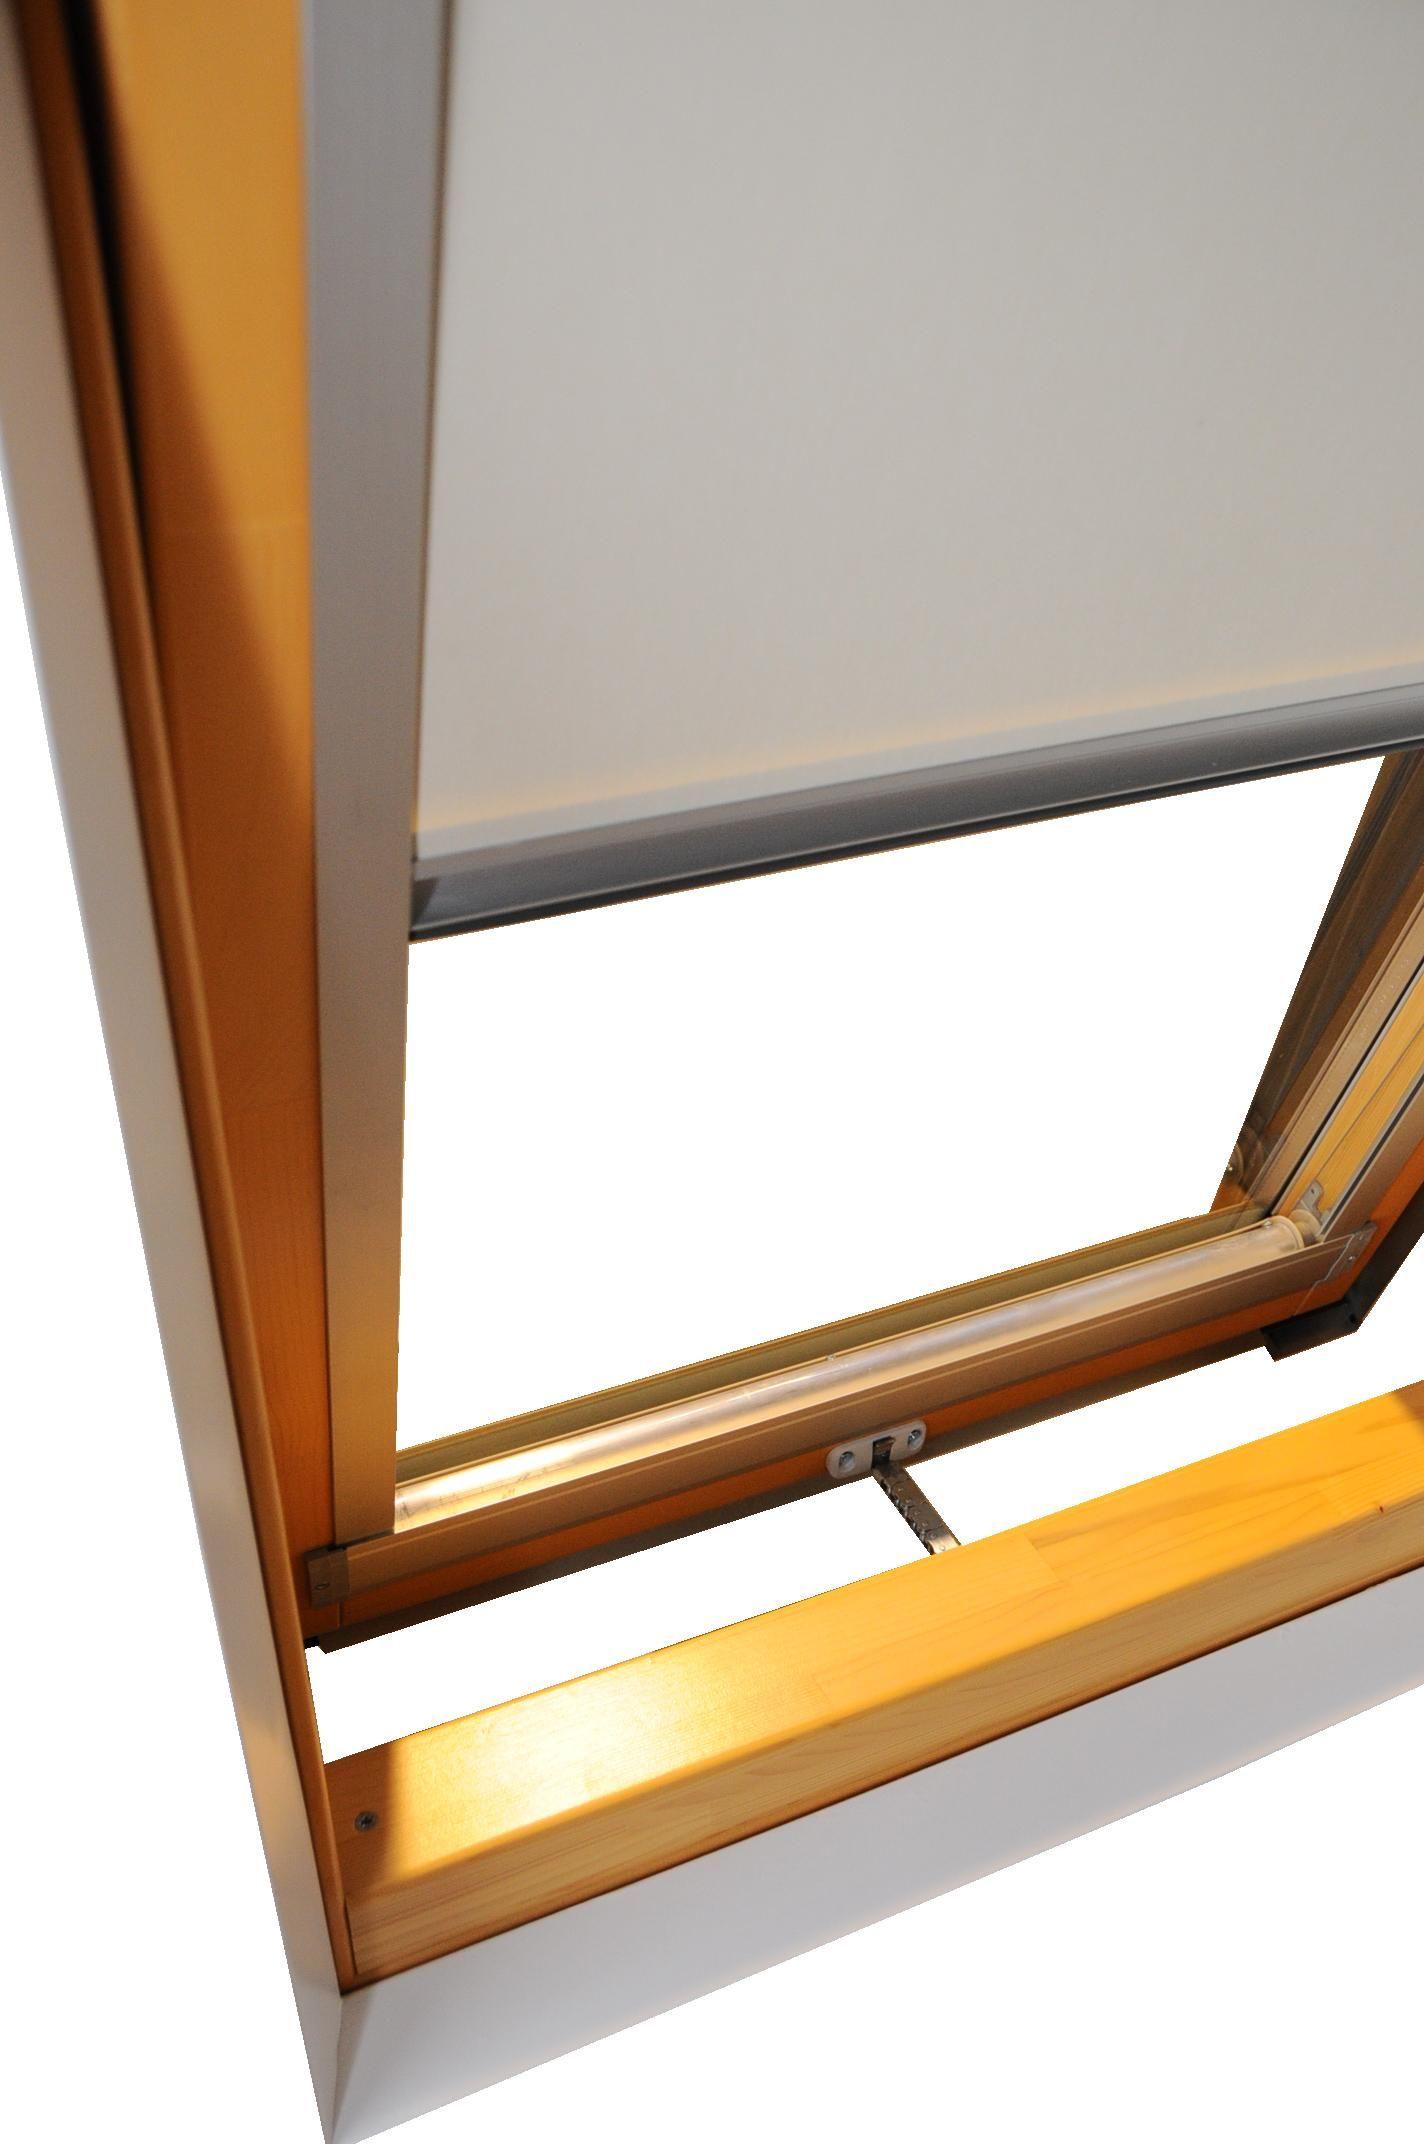 Cortina para ventanas de techo el ctrica de tejido t cnico for Ventanas para techo